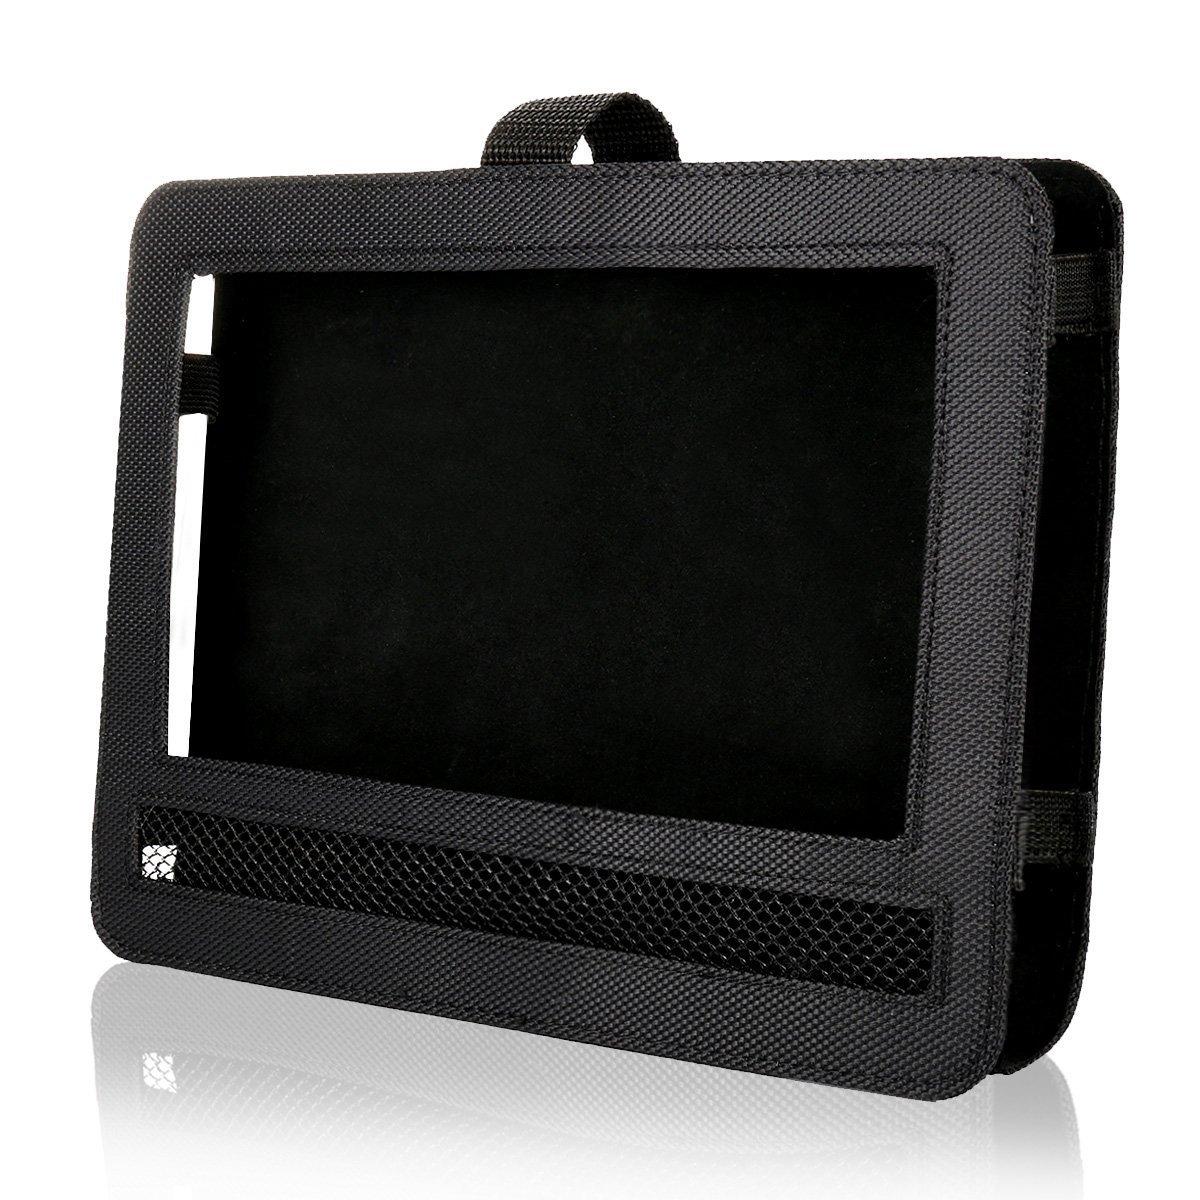 RUISIKIOU Universal Car DVD Player Holder, Portable Car DVD Headrest Mount Holder Strap Case for Swivel & Flip Style Portable DVD Player Color Black (10-10.5 Inch)